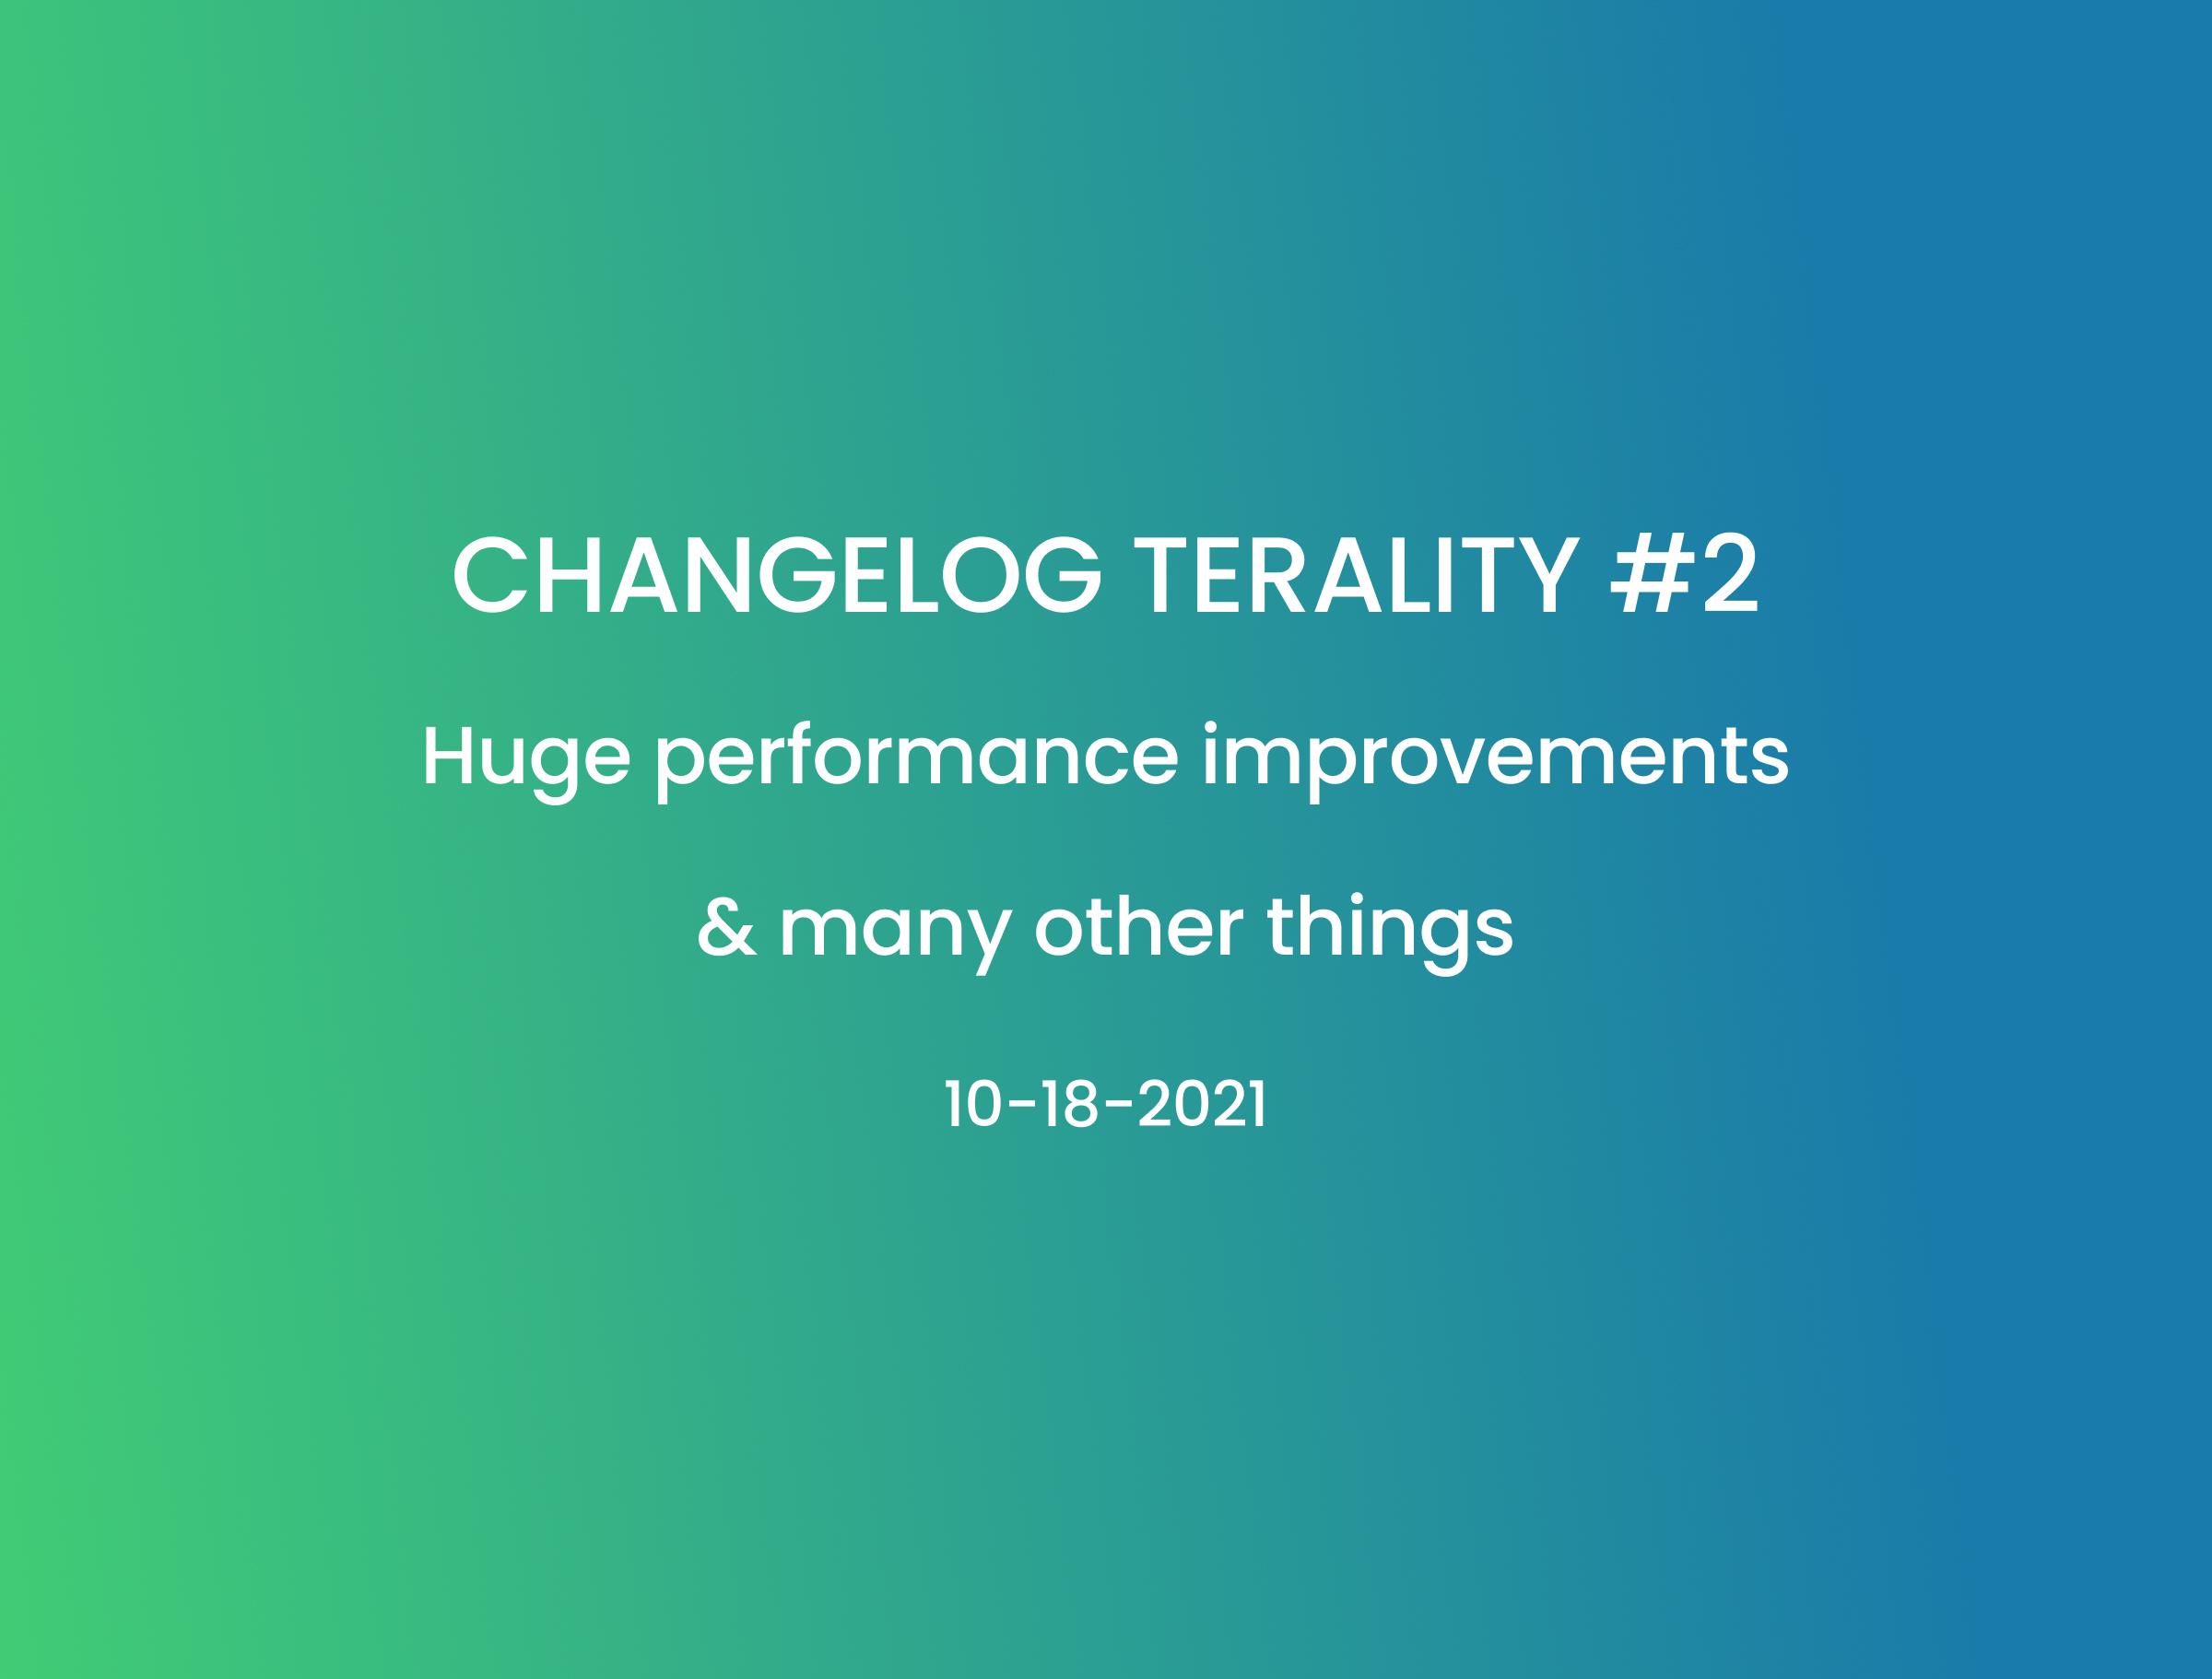 Changelog Terality #2: Huge Performance Improvements